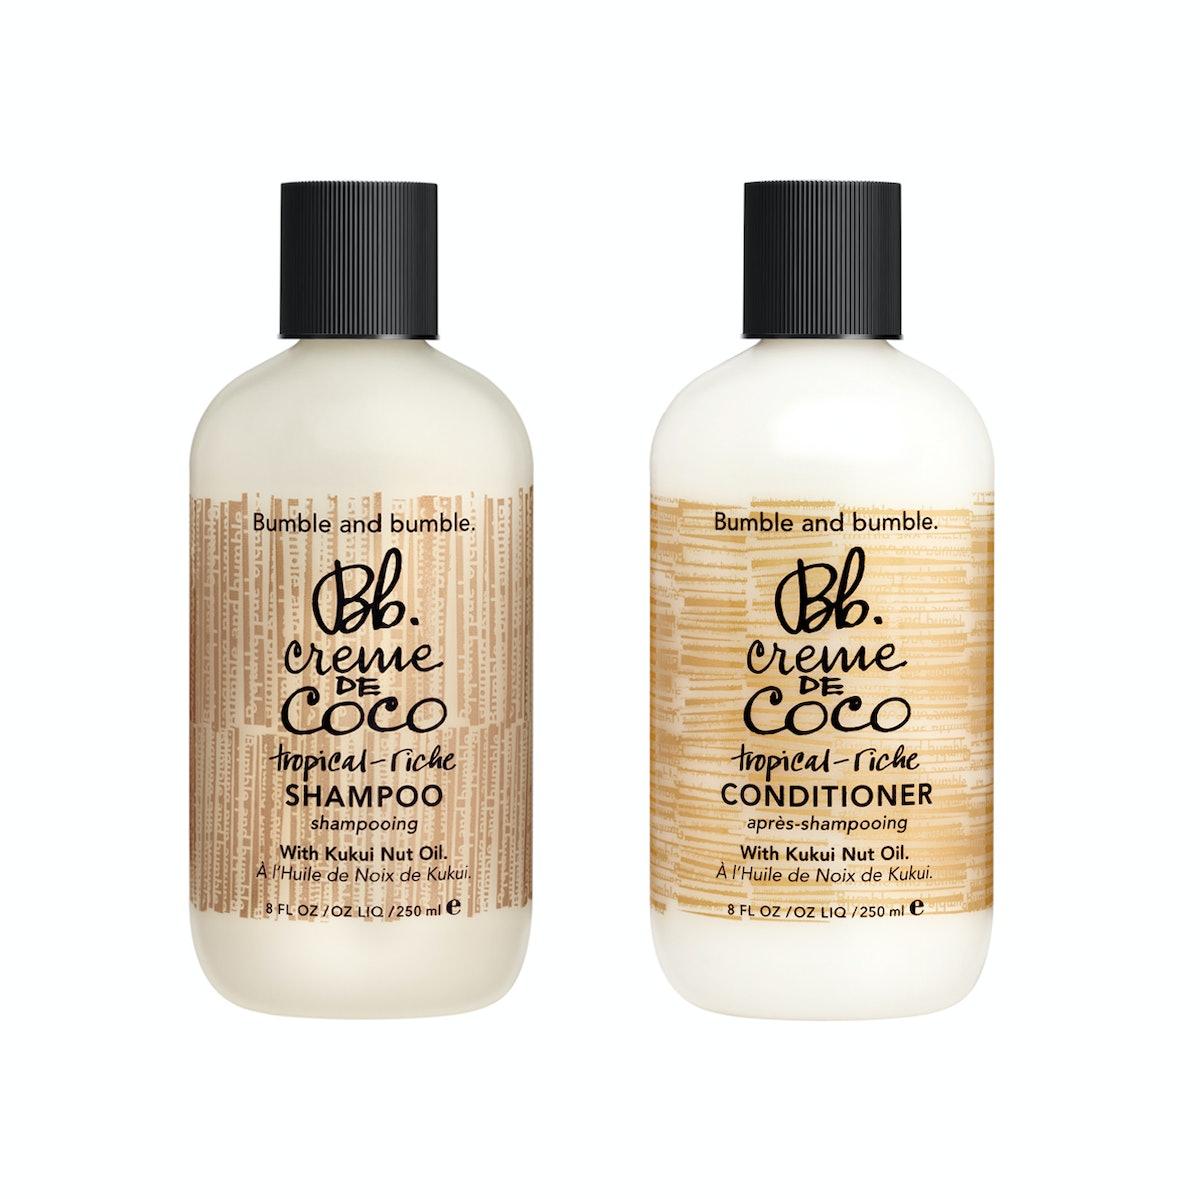 Bumble and bumble Crème de Coco Shampoo and Conditioner